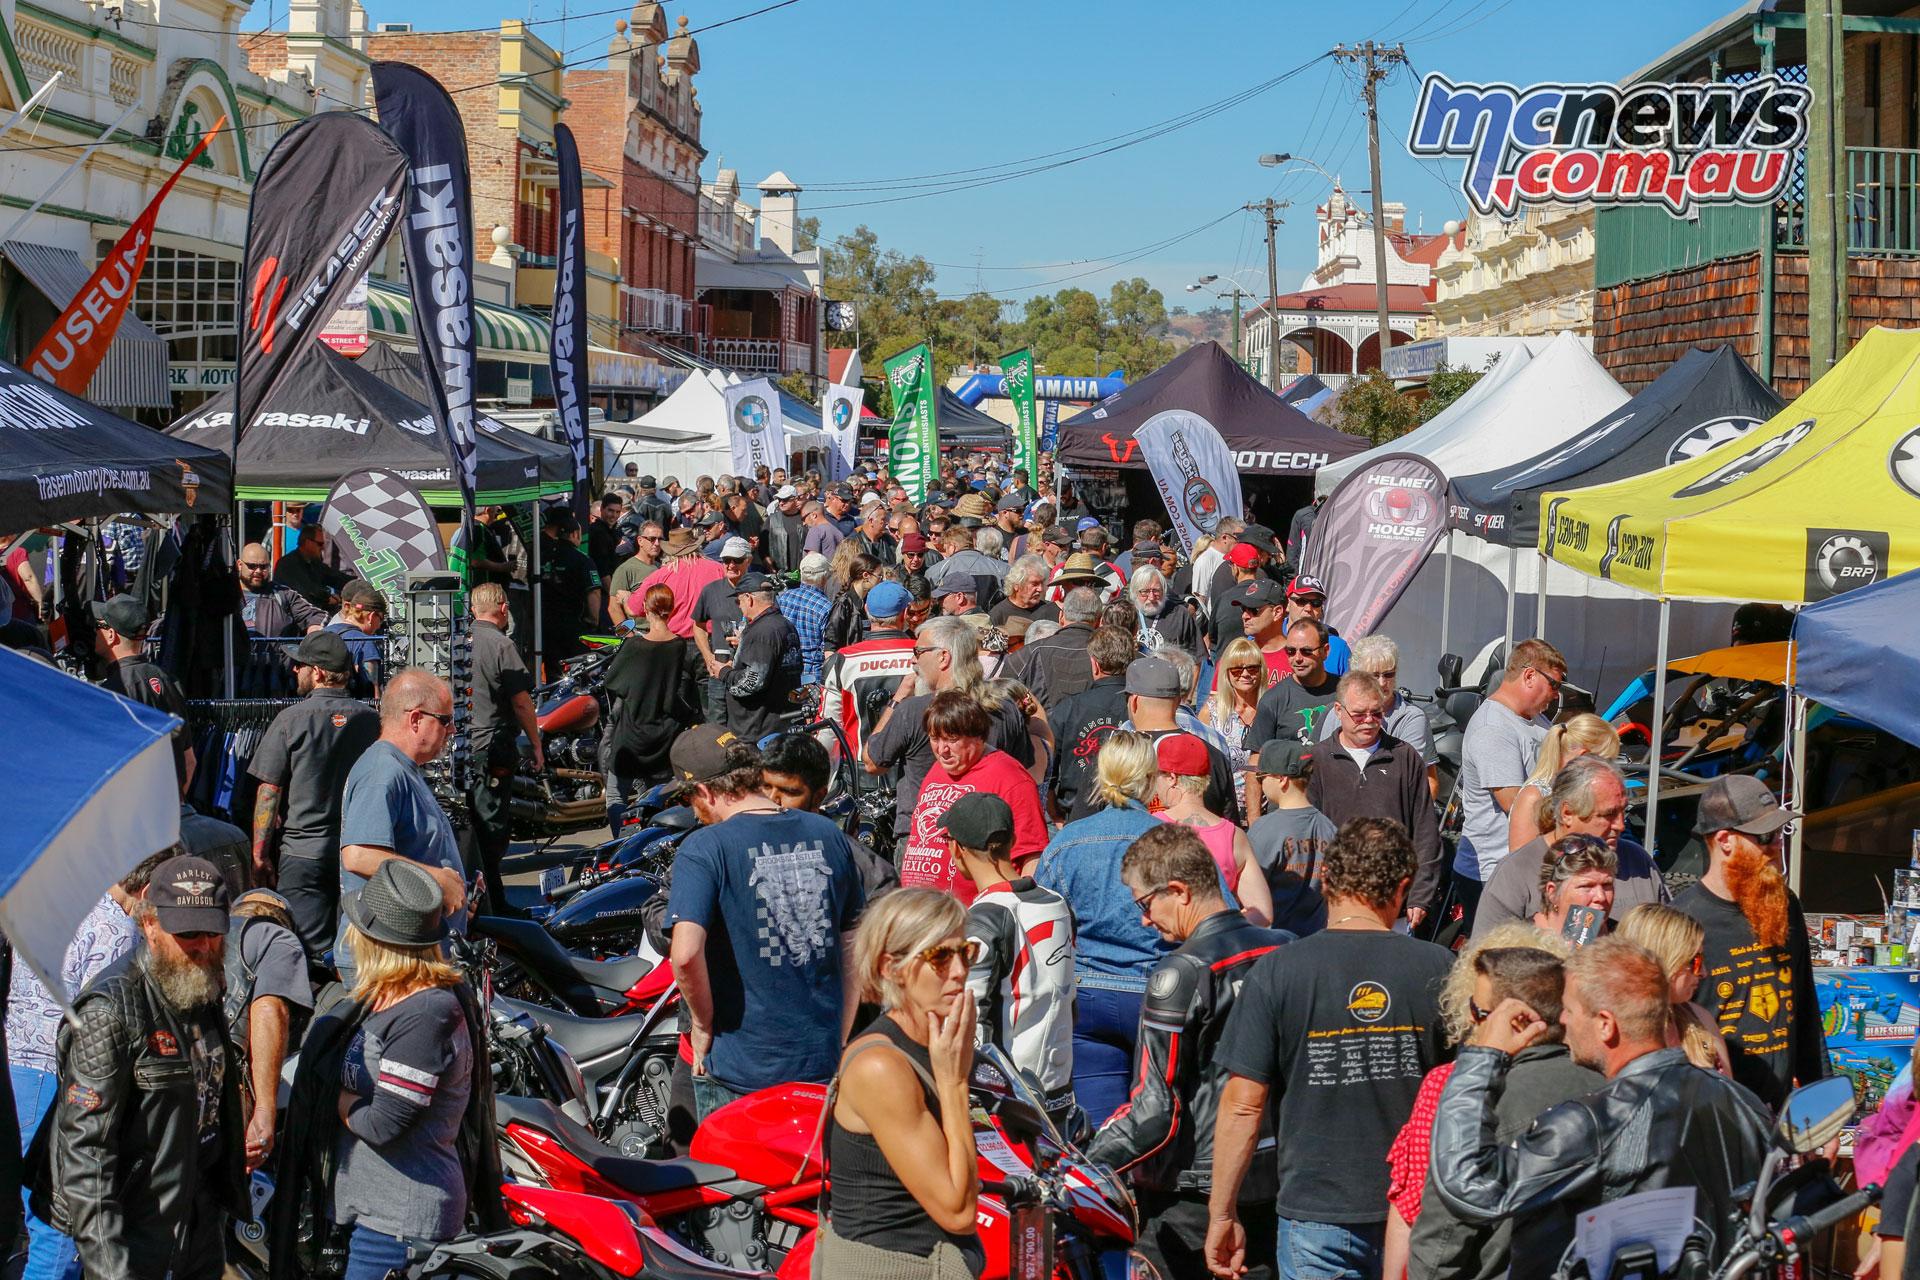 York Motorcycle Festival Crowds